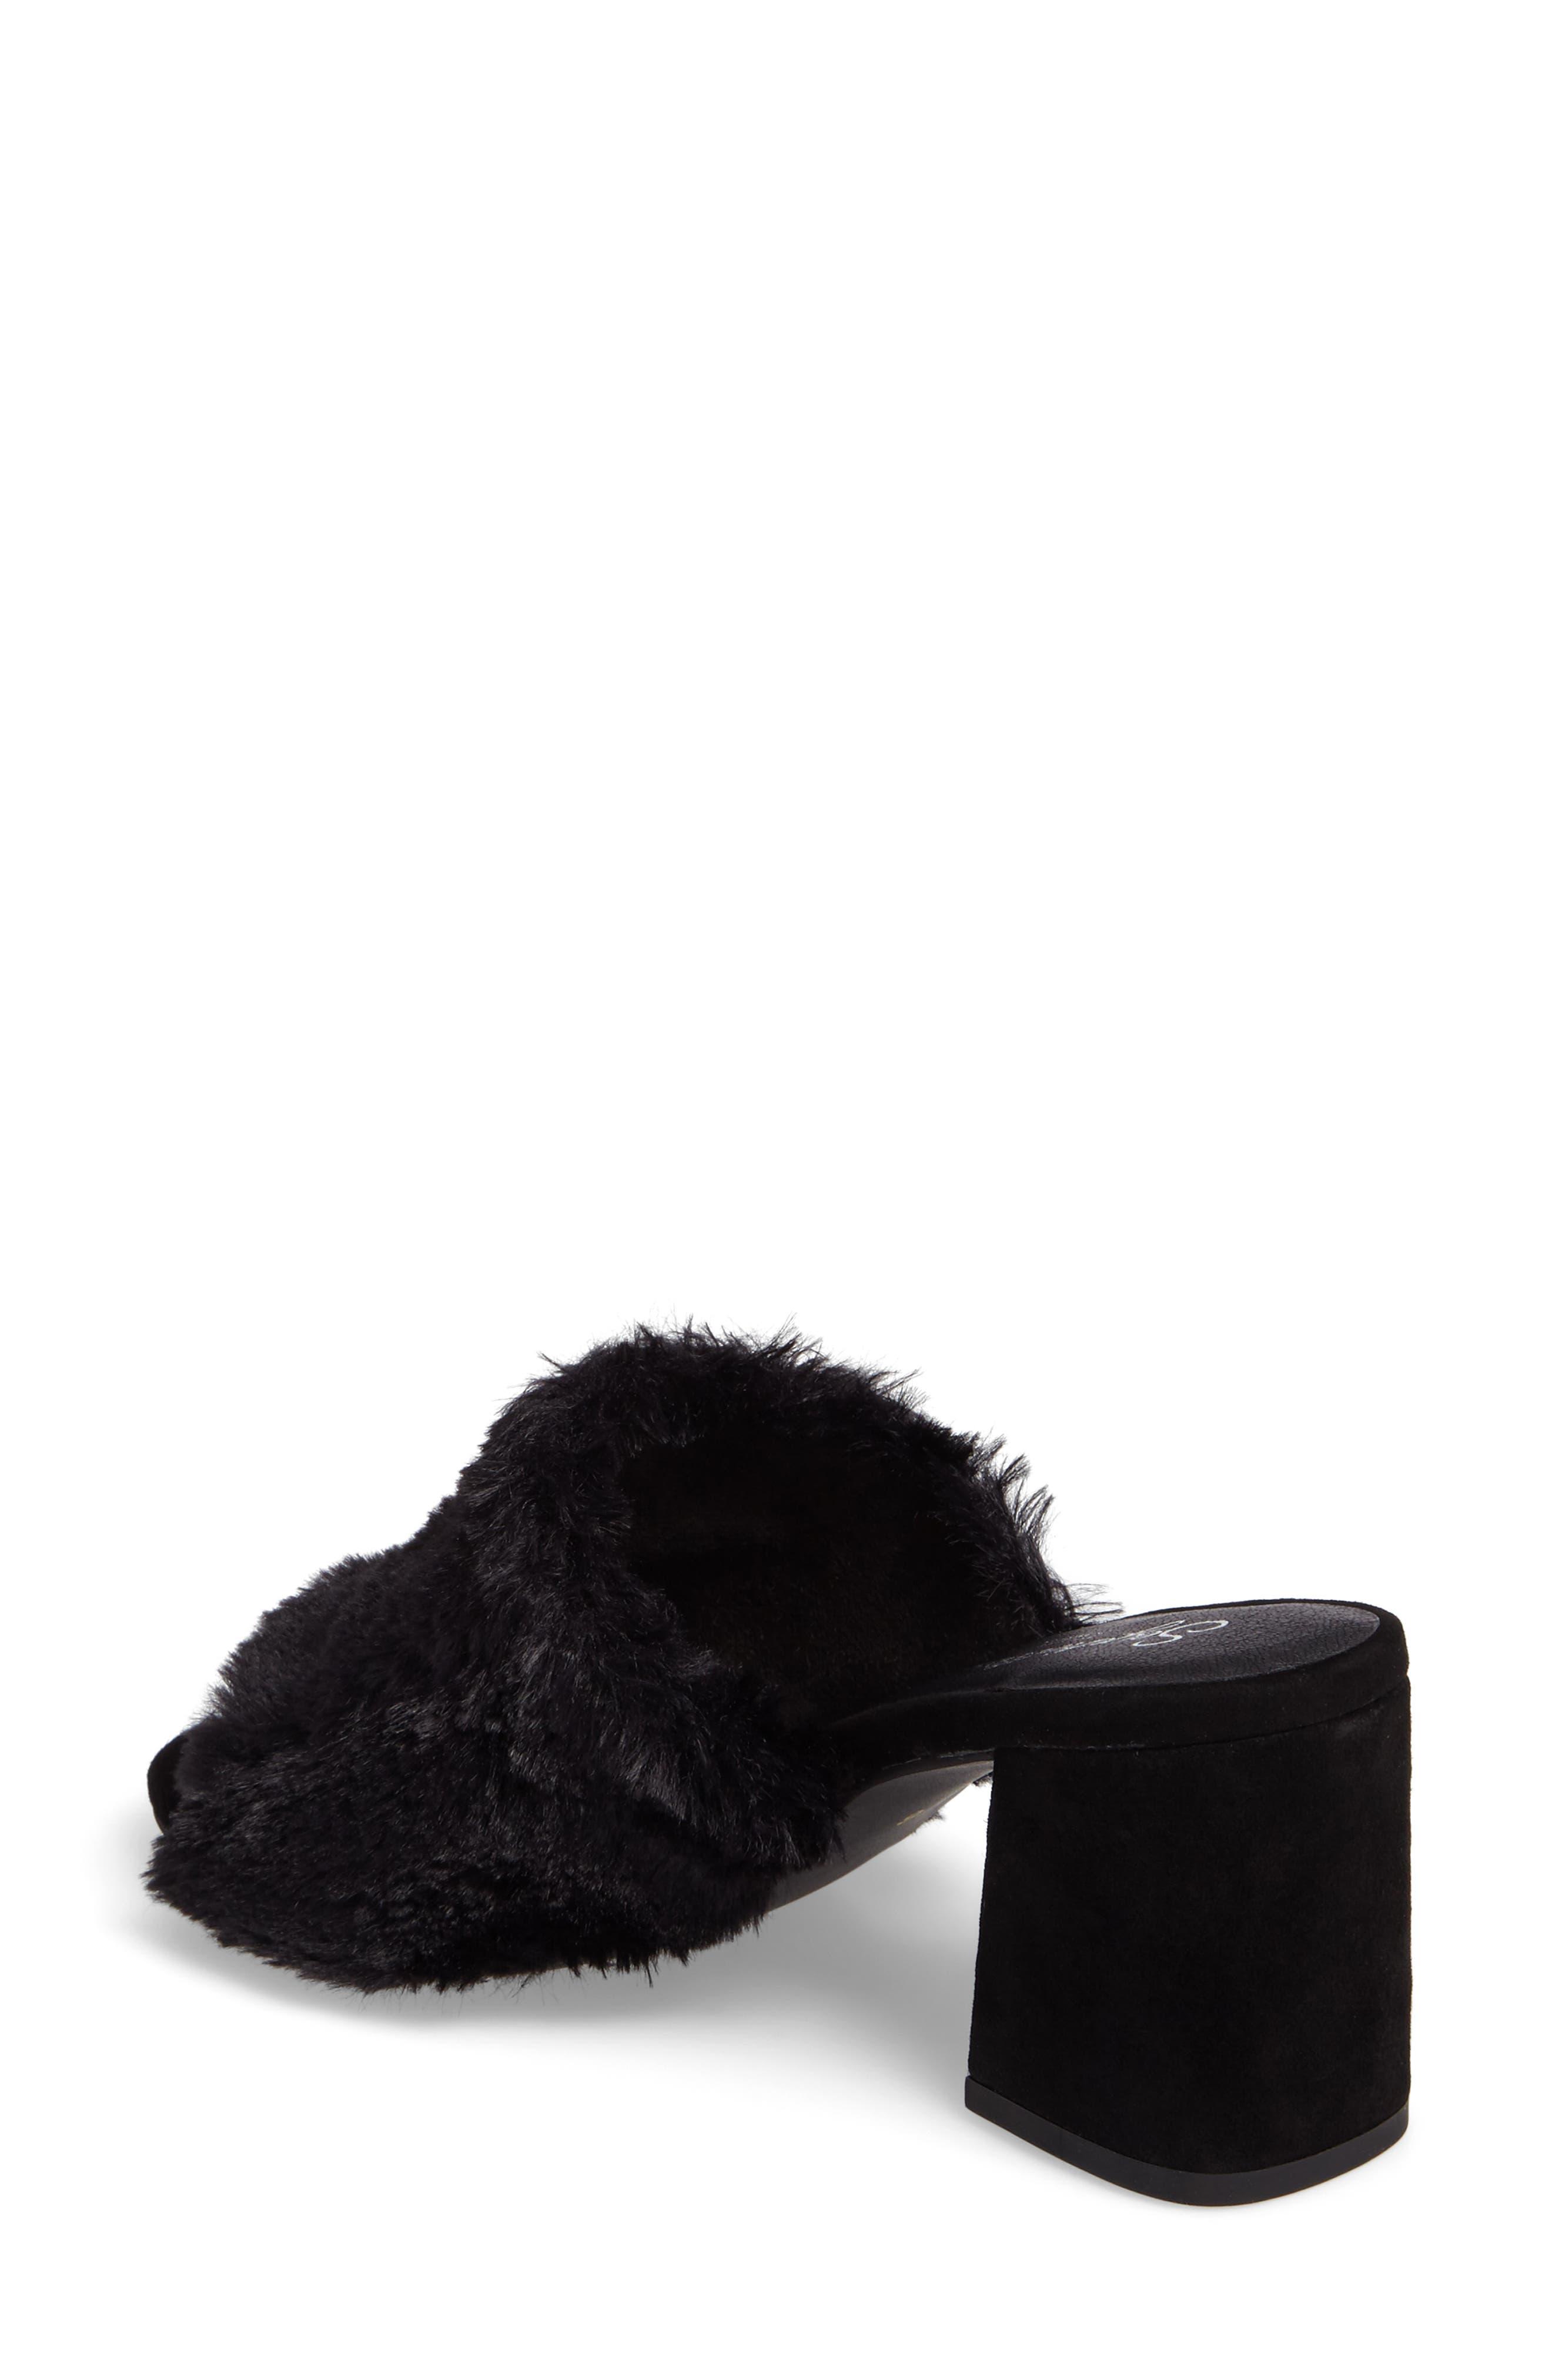 Nobody Else Faux Fur Slide Sandal,                             Alternate thumbnail 2, color,                             001